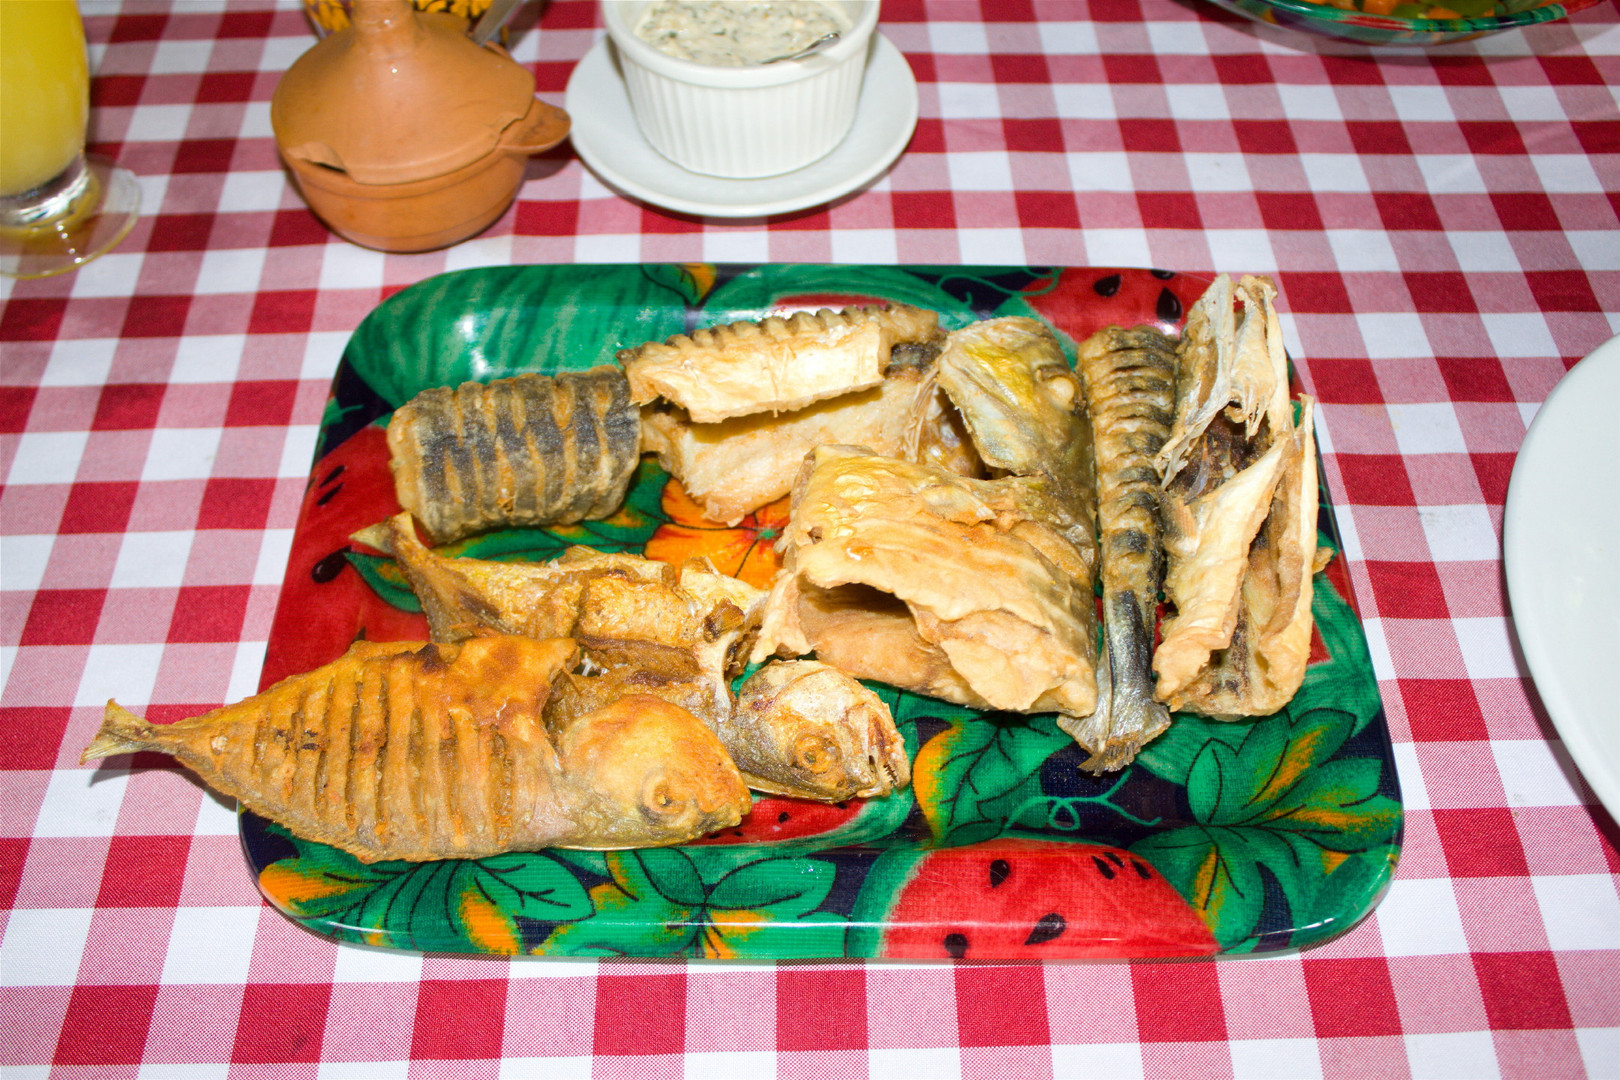 Pescado frito Pijibalodge